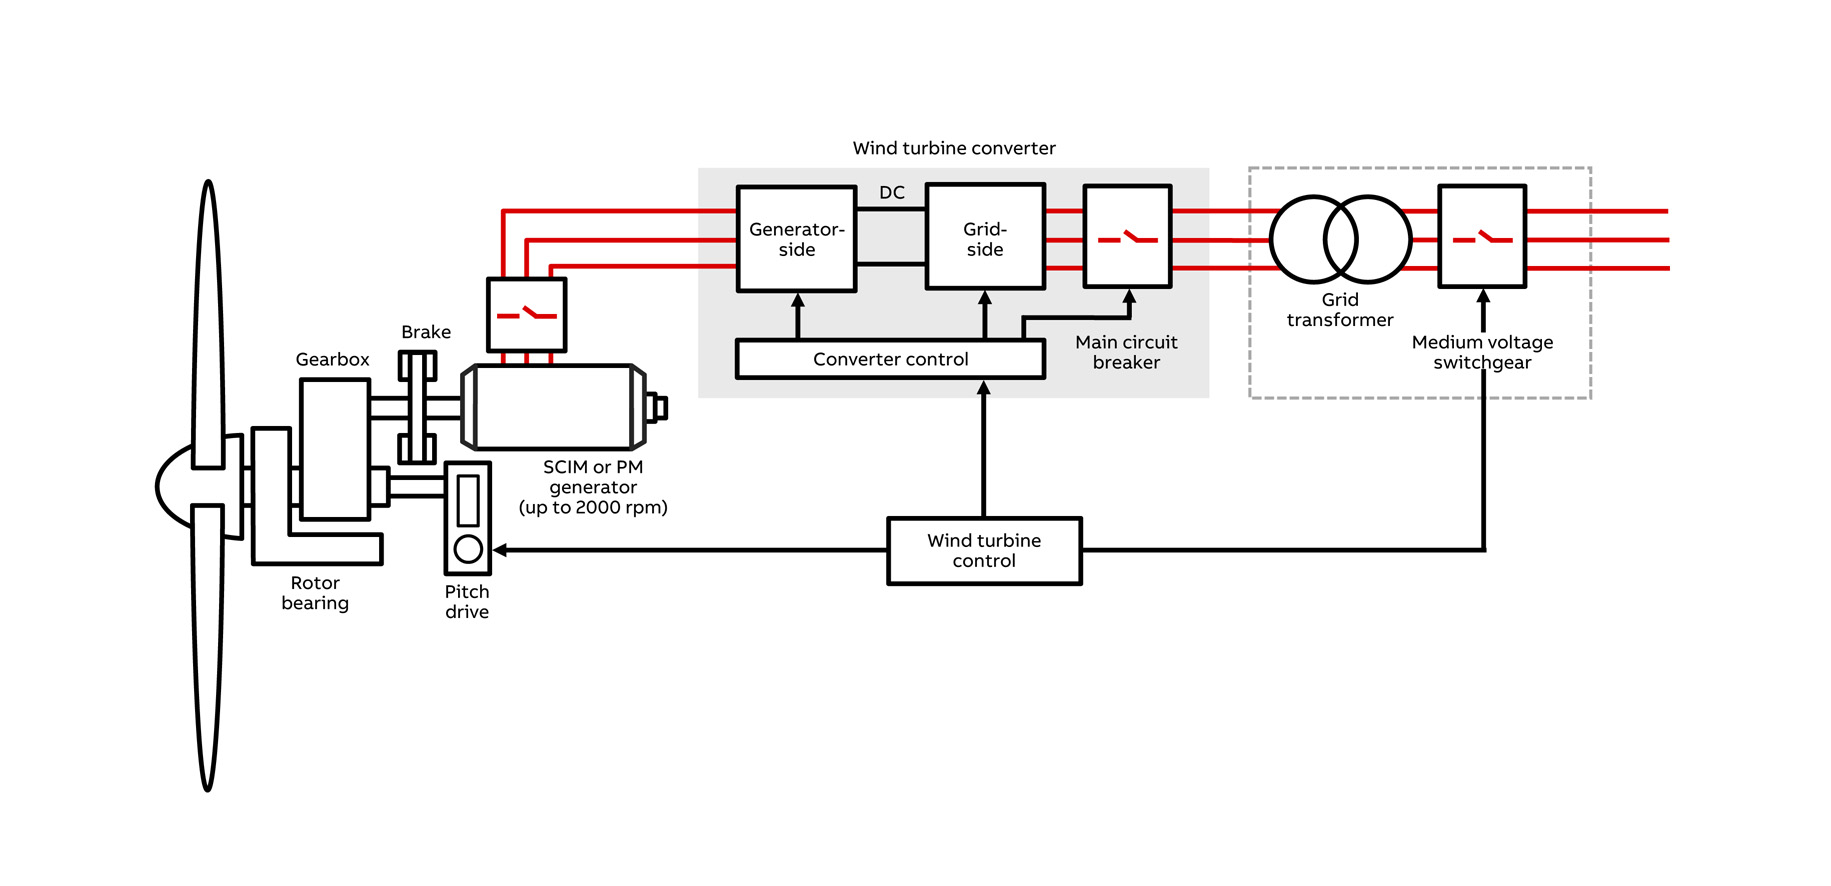 hight resolution of generator diagram pmg generator diagram wiring diagram blog figure 973 ac generator functional block diagram